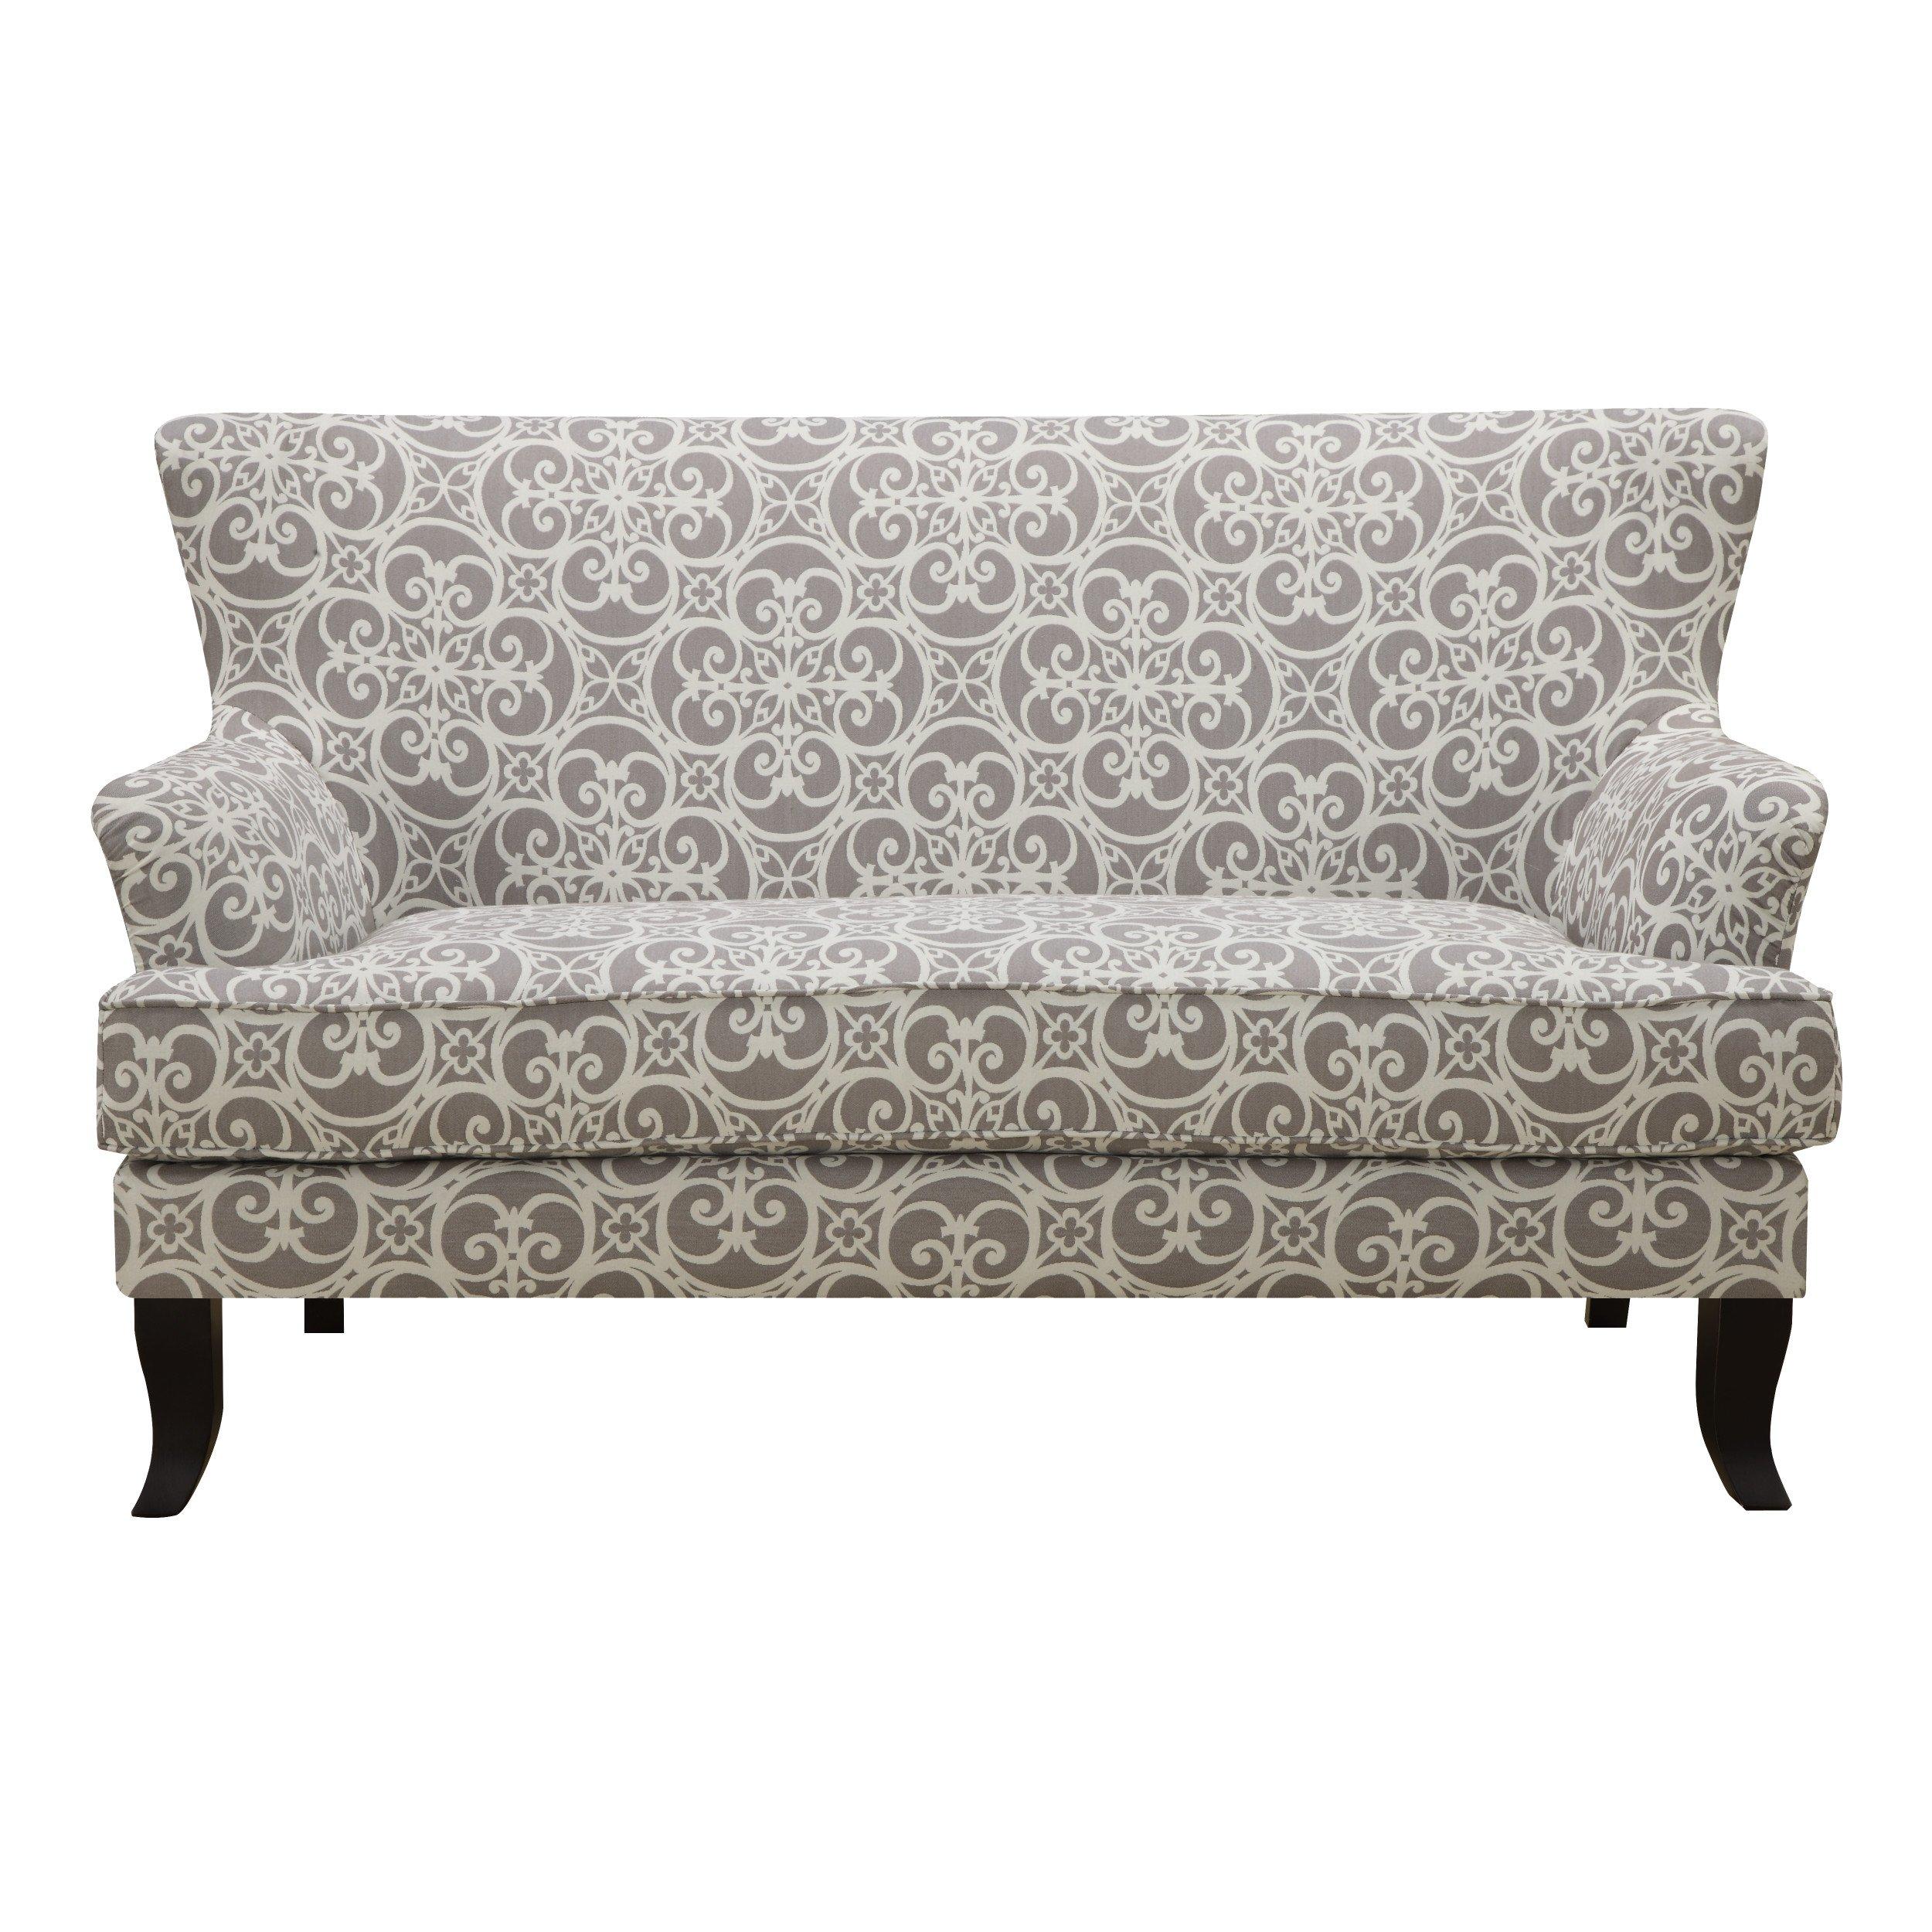 120mm 4pcs Chrome Sofa Plinth Legs FurnitureChair Cabinet Beds Settee  Legs